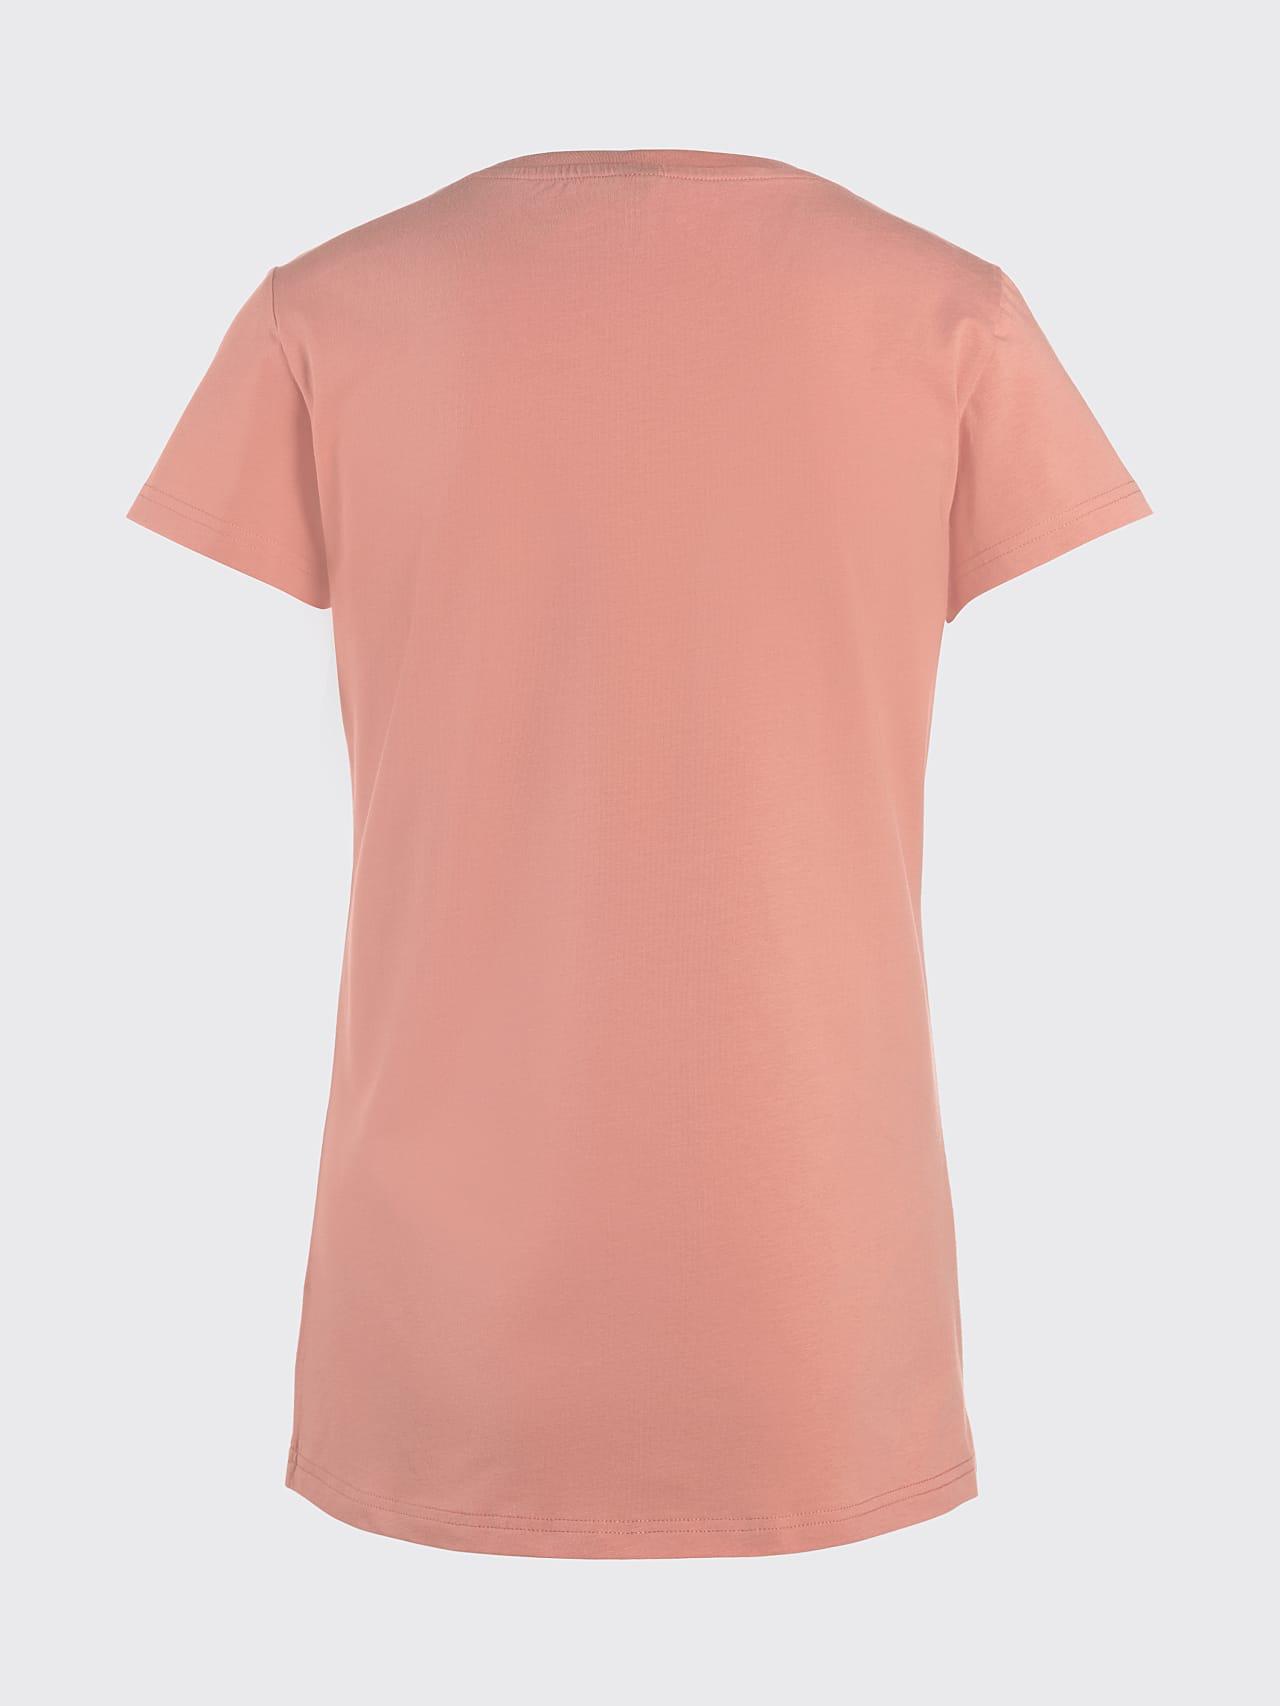 JERU V2.Y4.02 Signature Logo T-Shirt coral Left Alpha Tauri